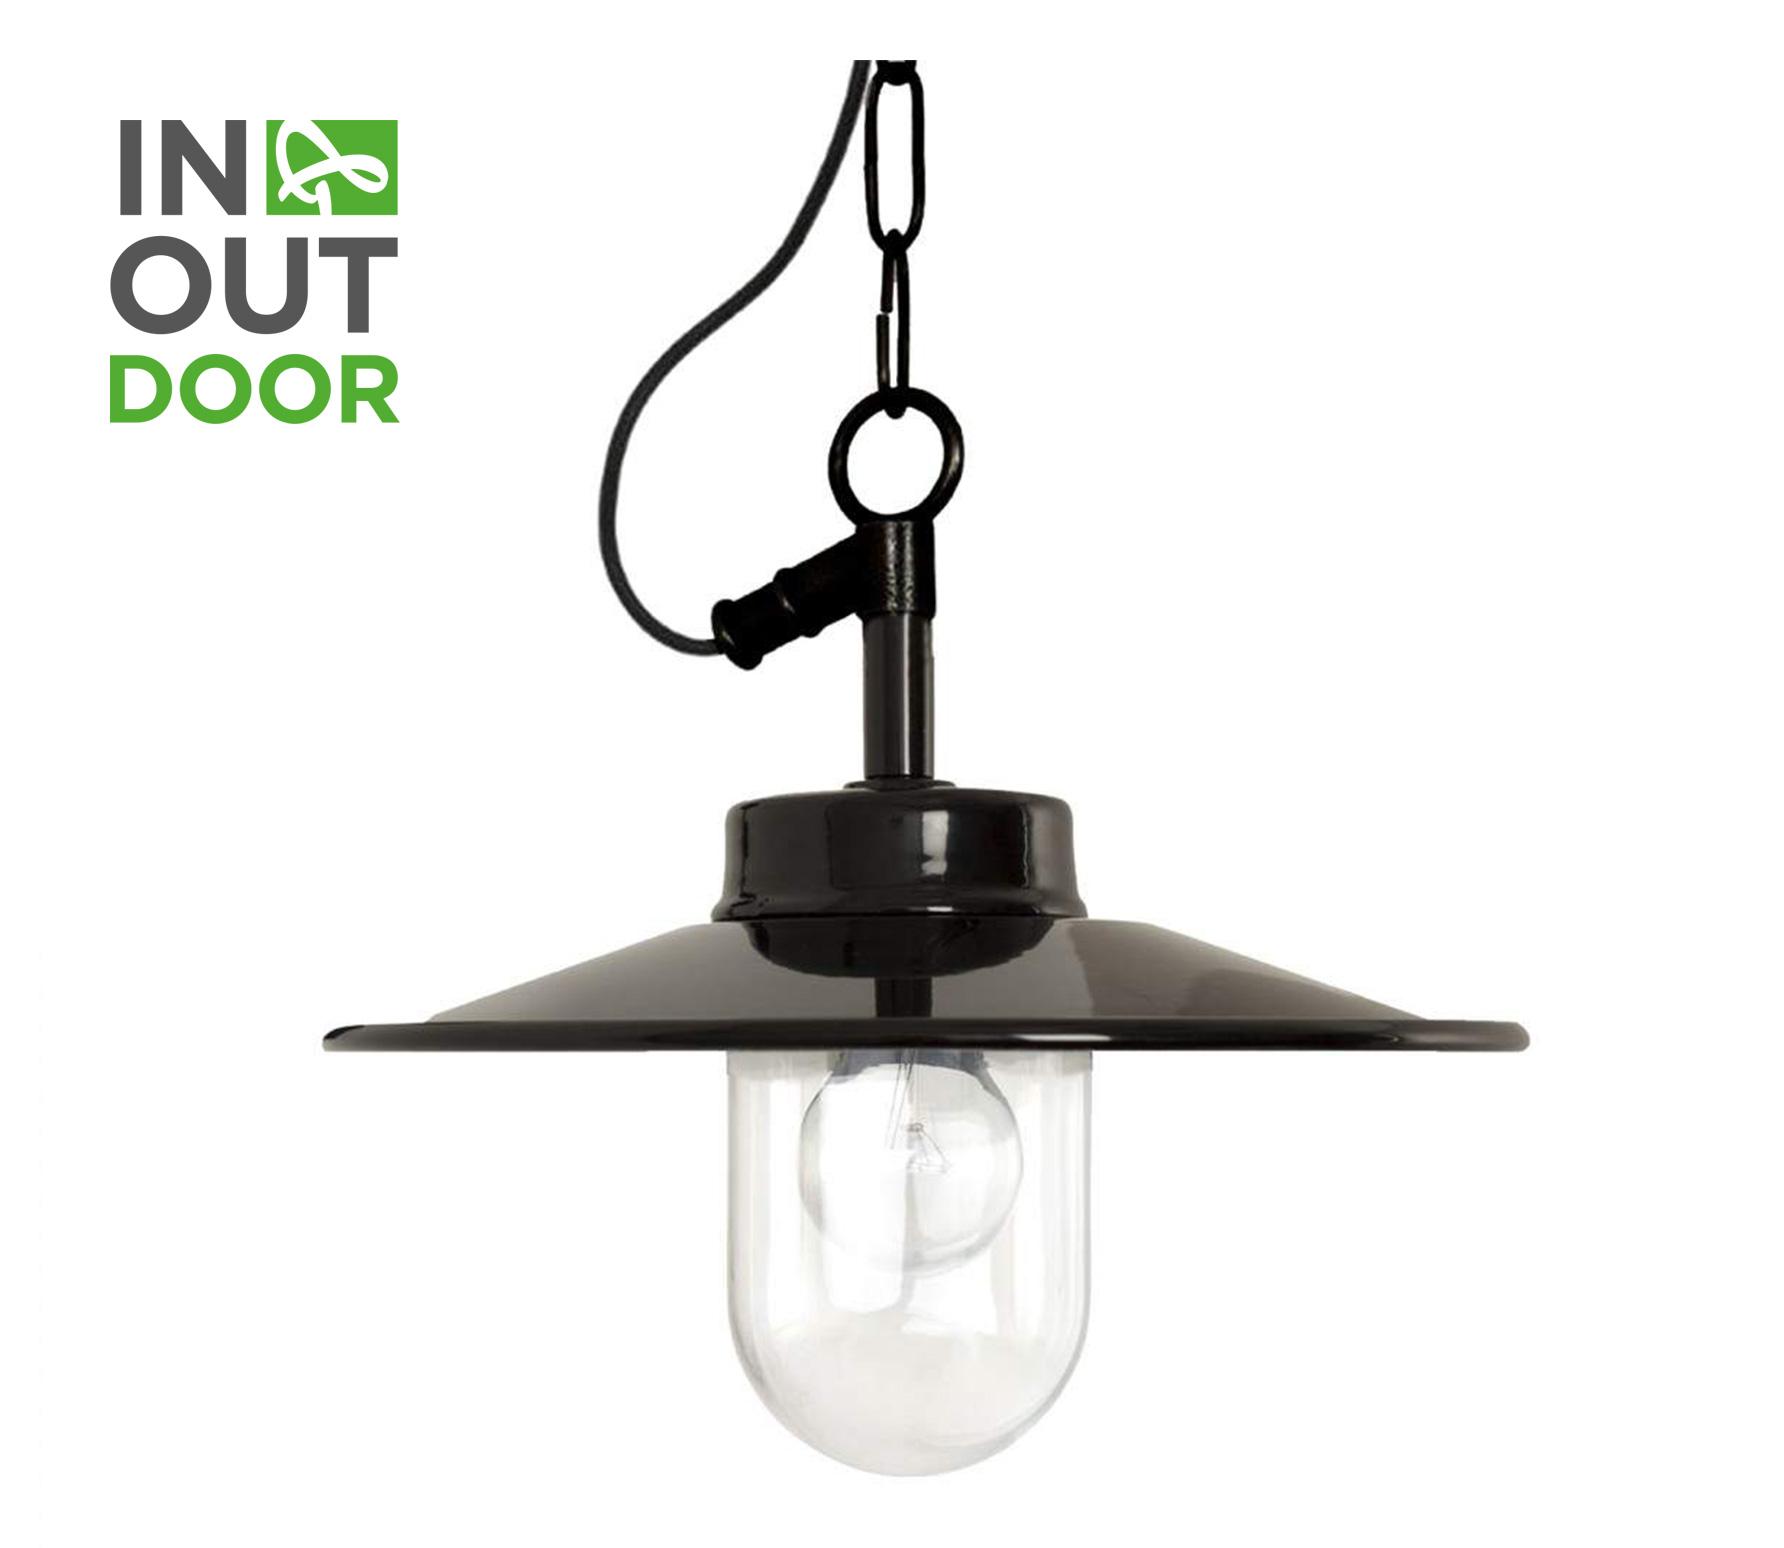 Vita hanglamp aan ketting zwart metaal